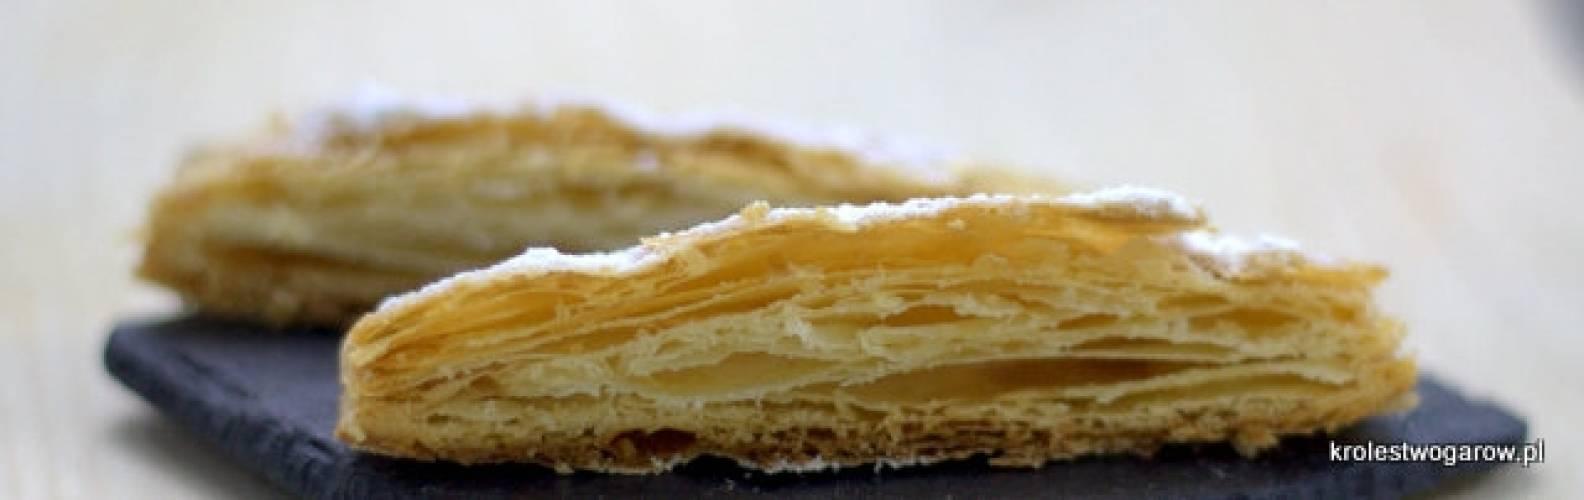 Ciasto francuskie innym sposobem